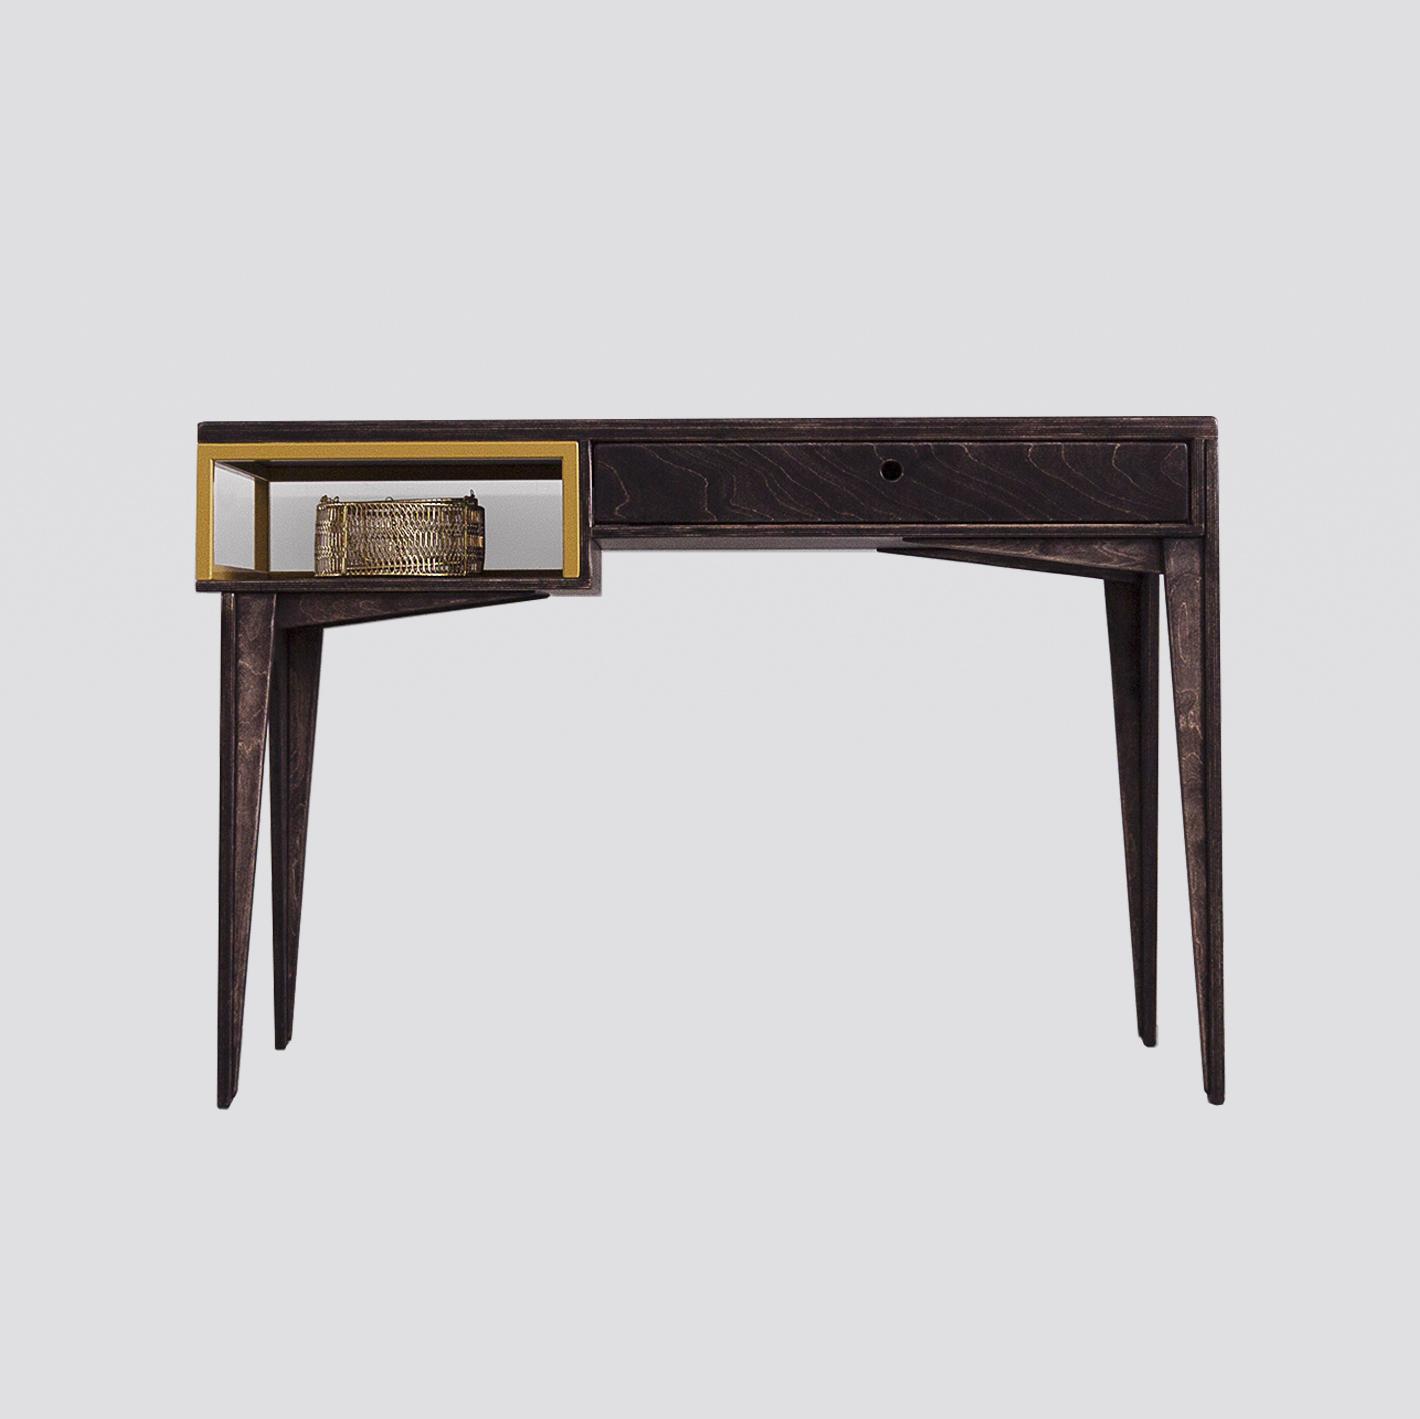 Zdjęcie produktu RUNO.lit biurko